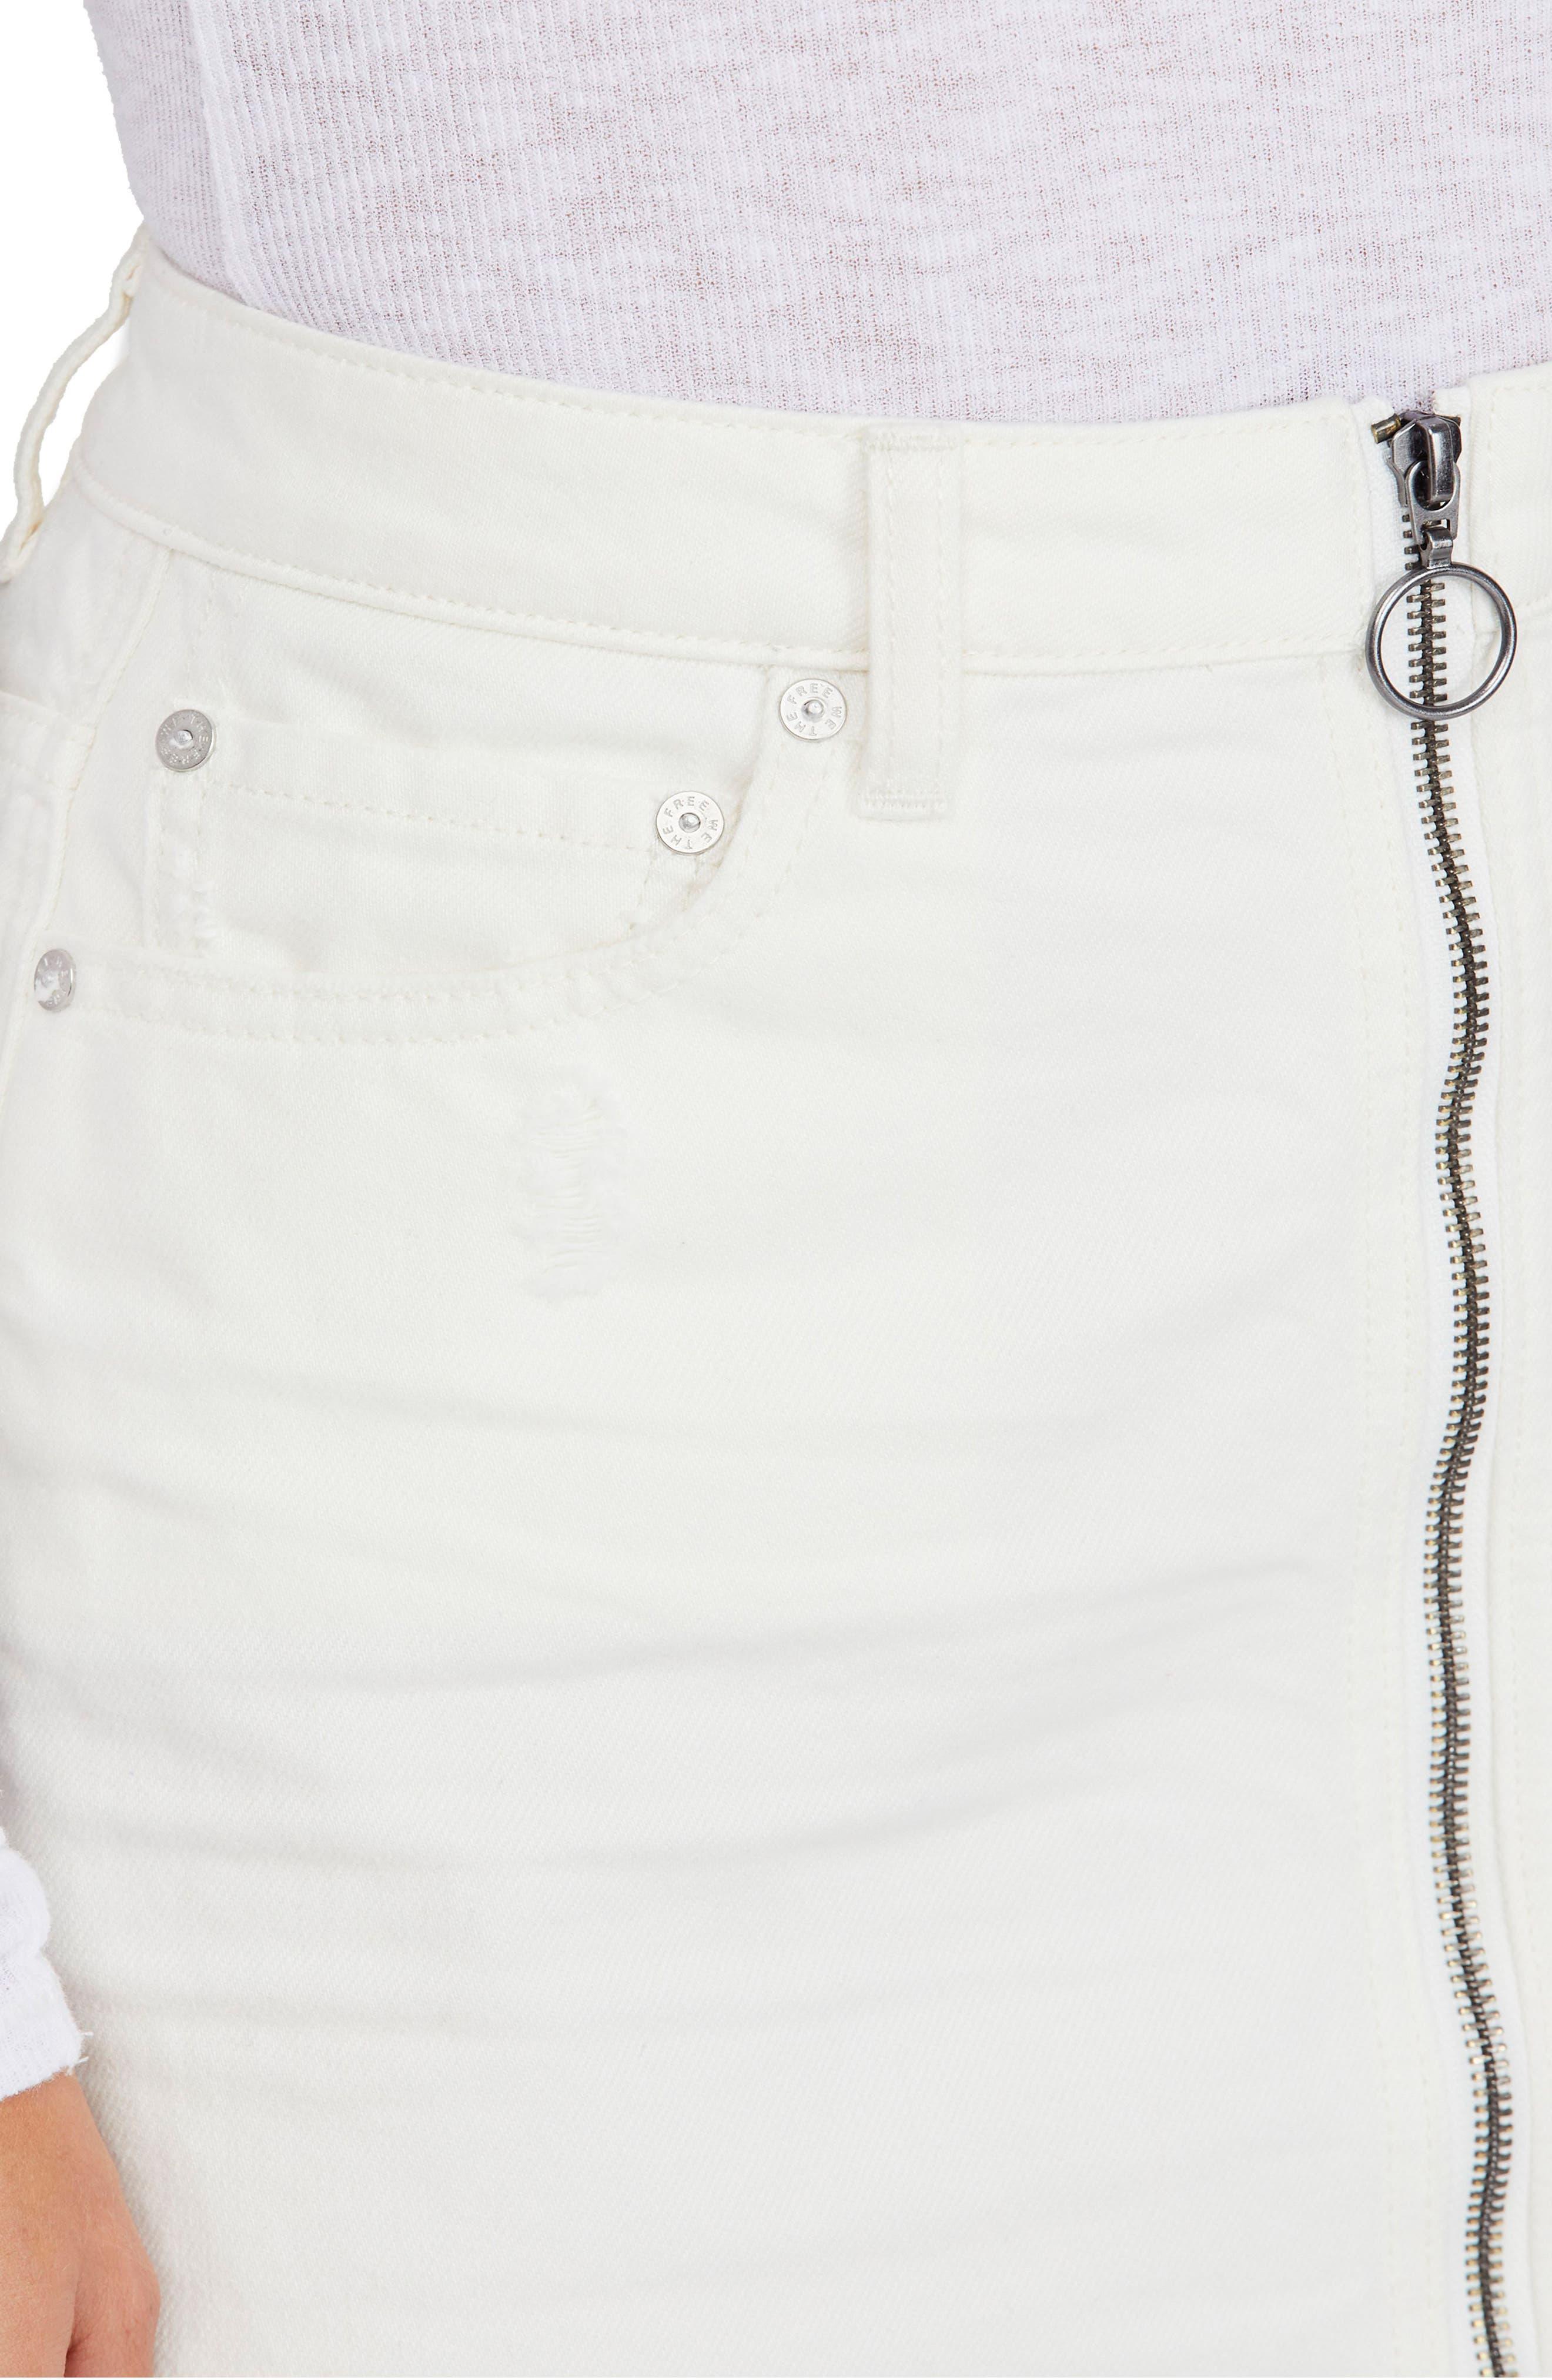 FREE PEOPLE,                             Zip It Up Denim Miniskirt,                             Alternate thumbnail 4, color,                             WHITE